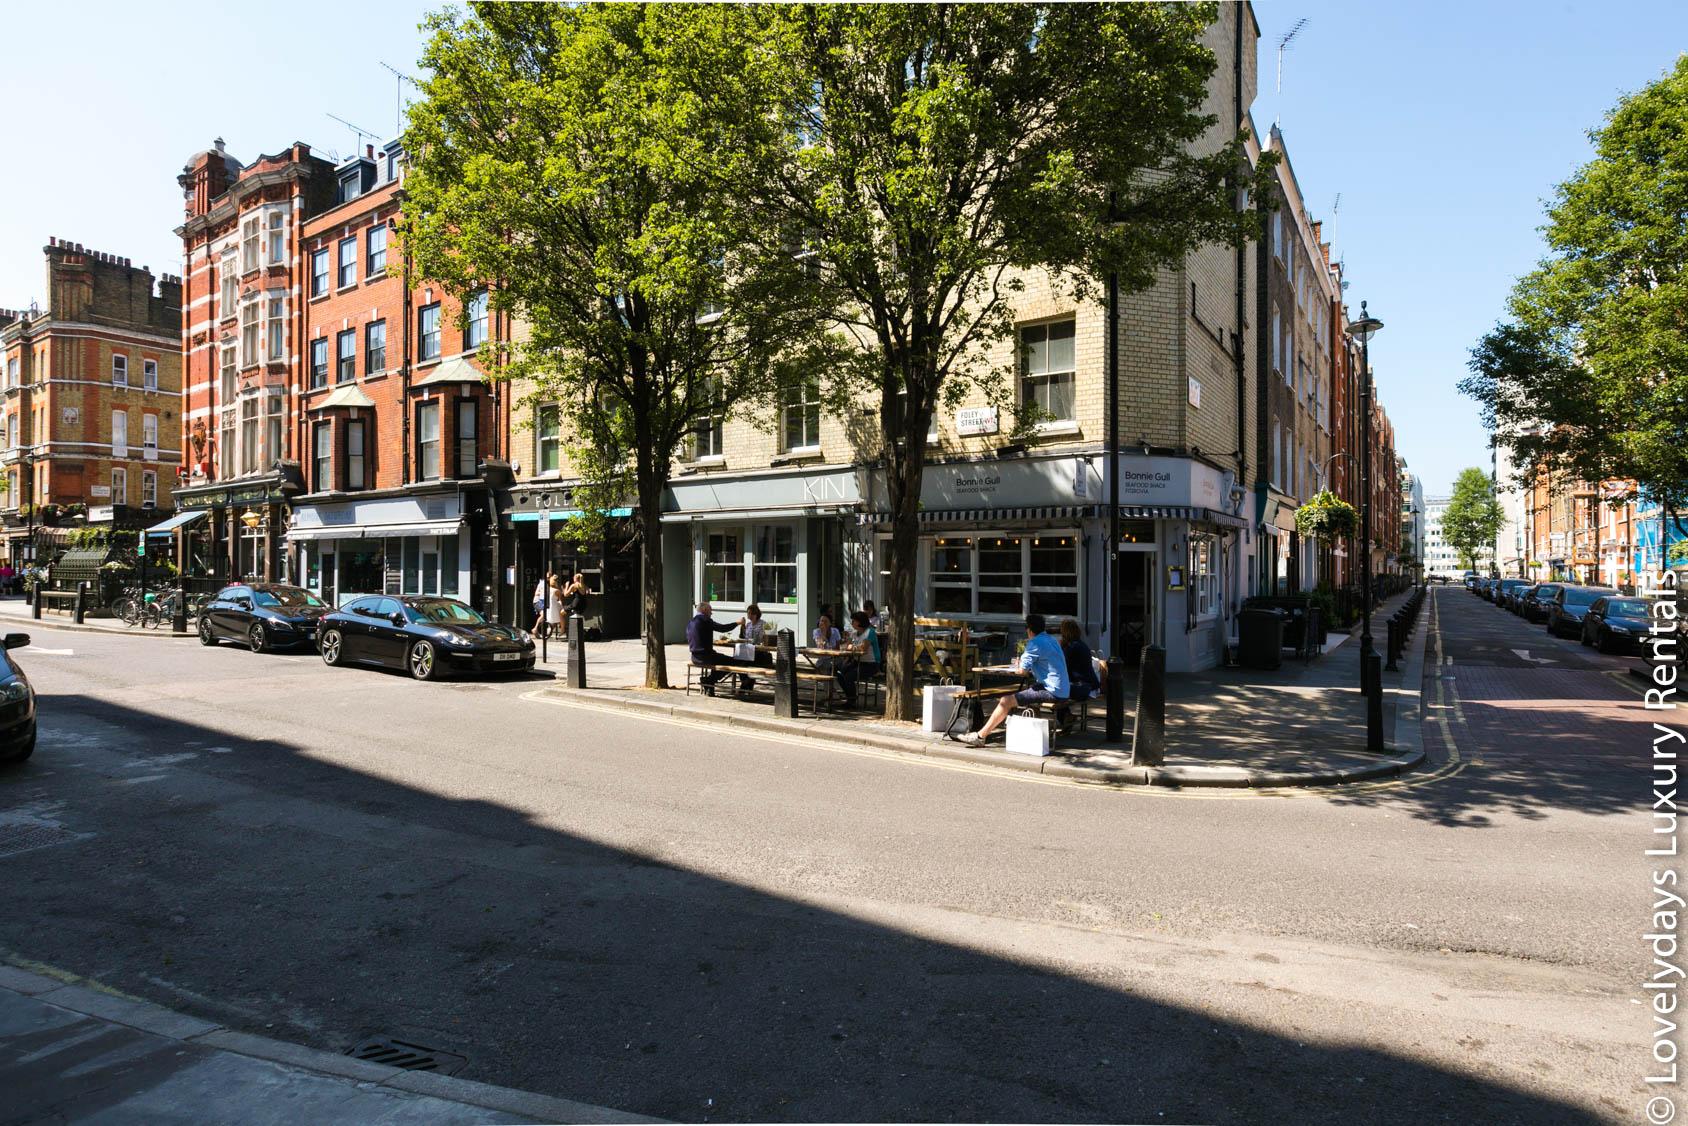 Lovelydays luxury service apartment rental - London - Fitzrovia - Foley Street - Lovelysuite - 2 bedrooms - 2 bathrooms - Exterior - exterior - 409b0870f18d - Lovelydays